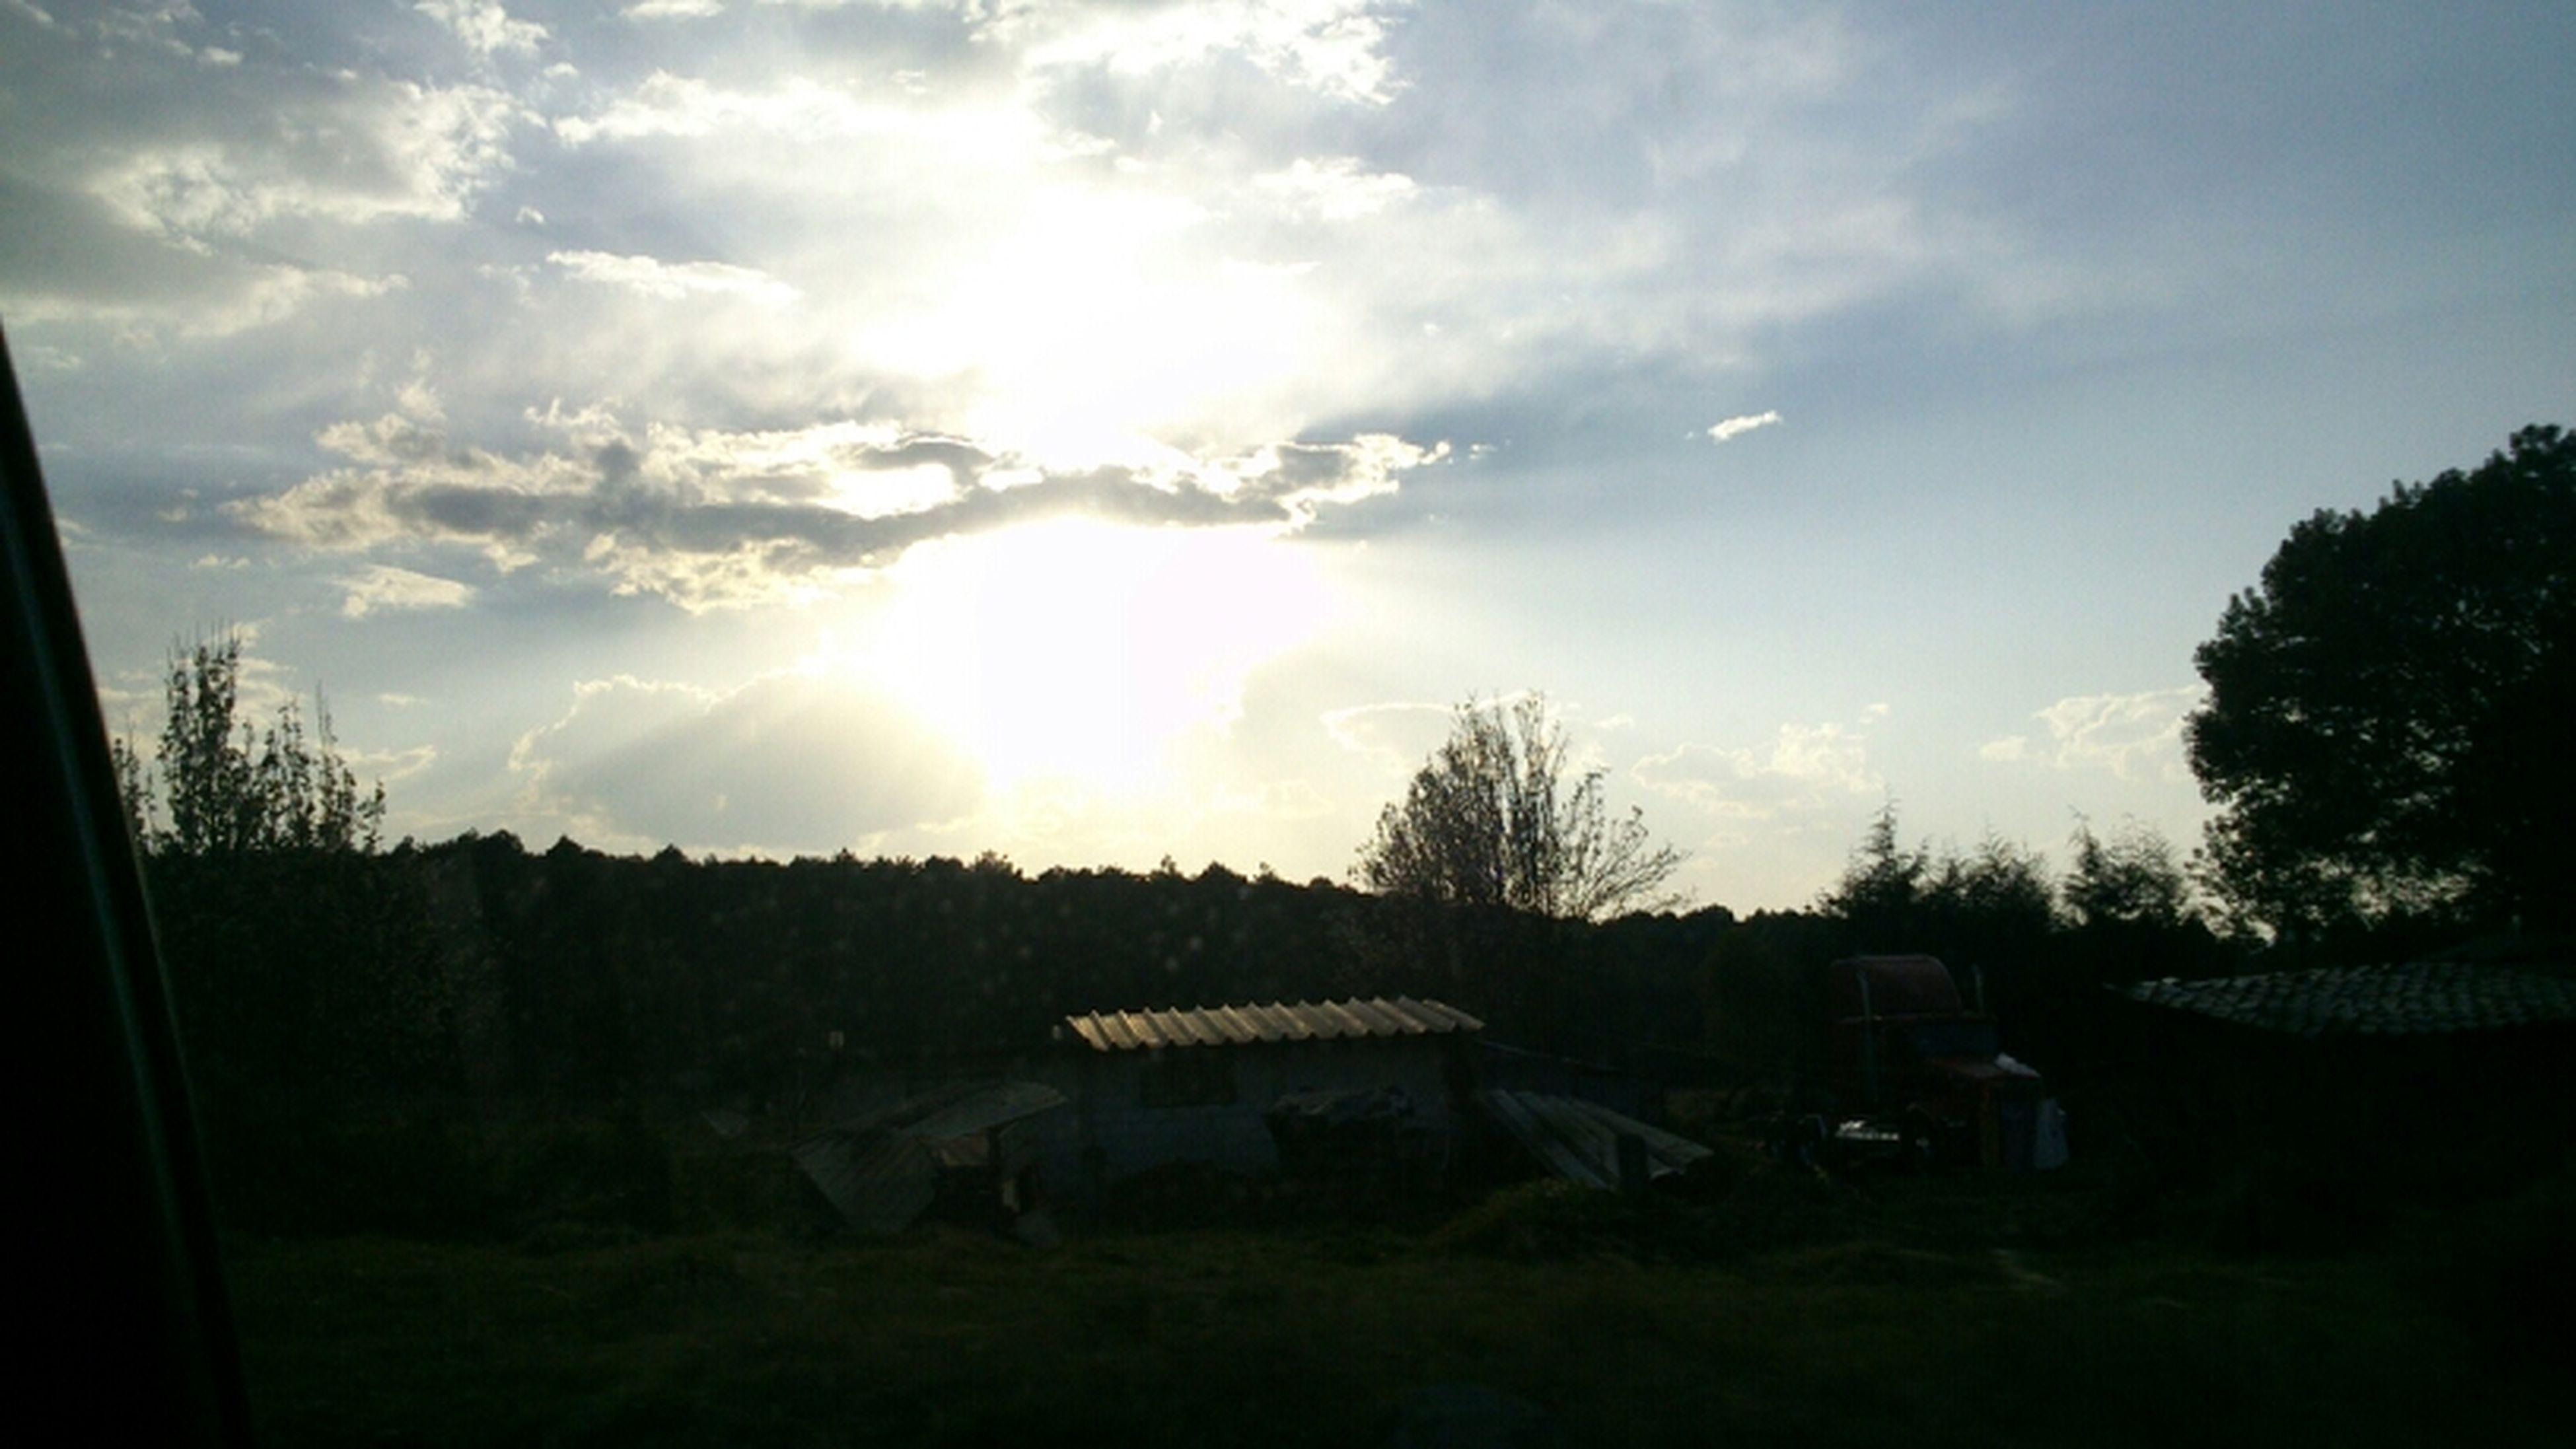 sky, tree, sun, silhouette, building exterior, built structure, house, cloud - sky, sunset, landscape, sunbeam, sunlight, architecture, field, nature, rural scene, tranquil scene, cloud, tranquility, scenics